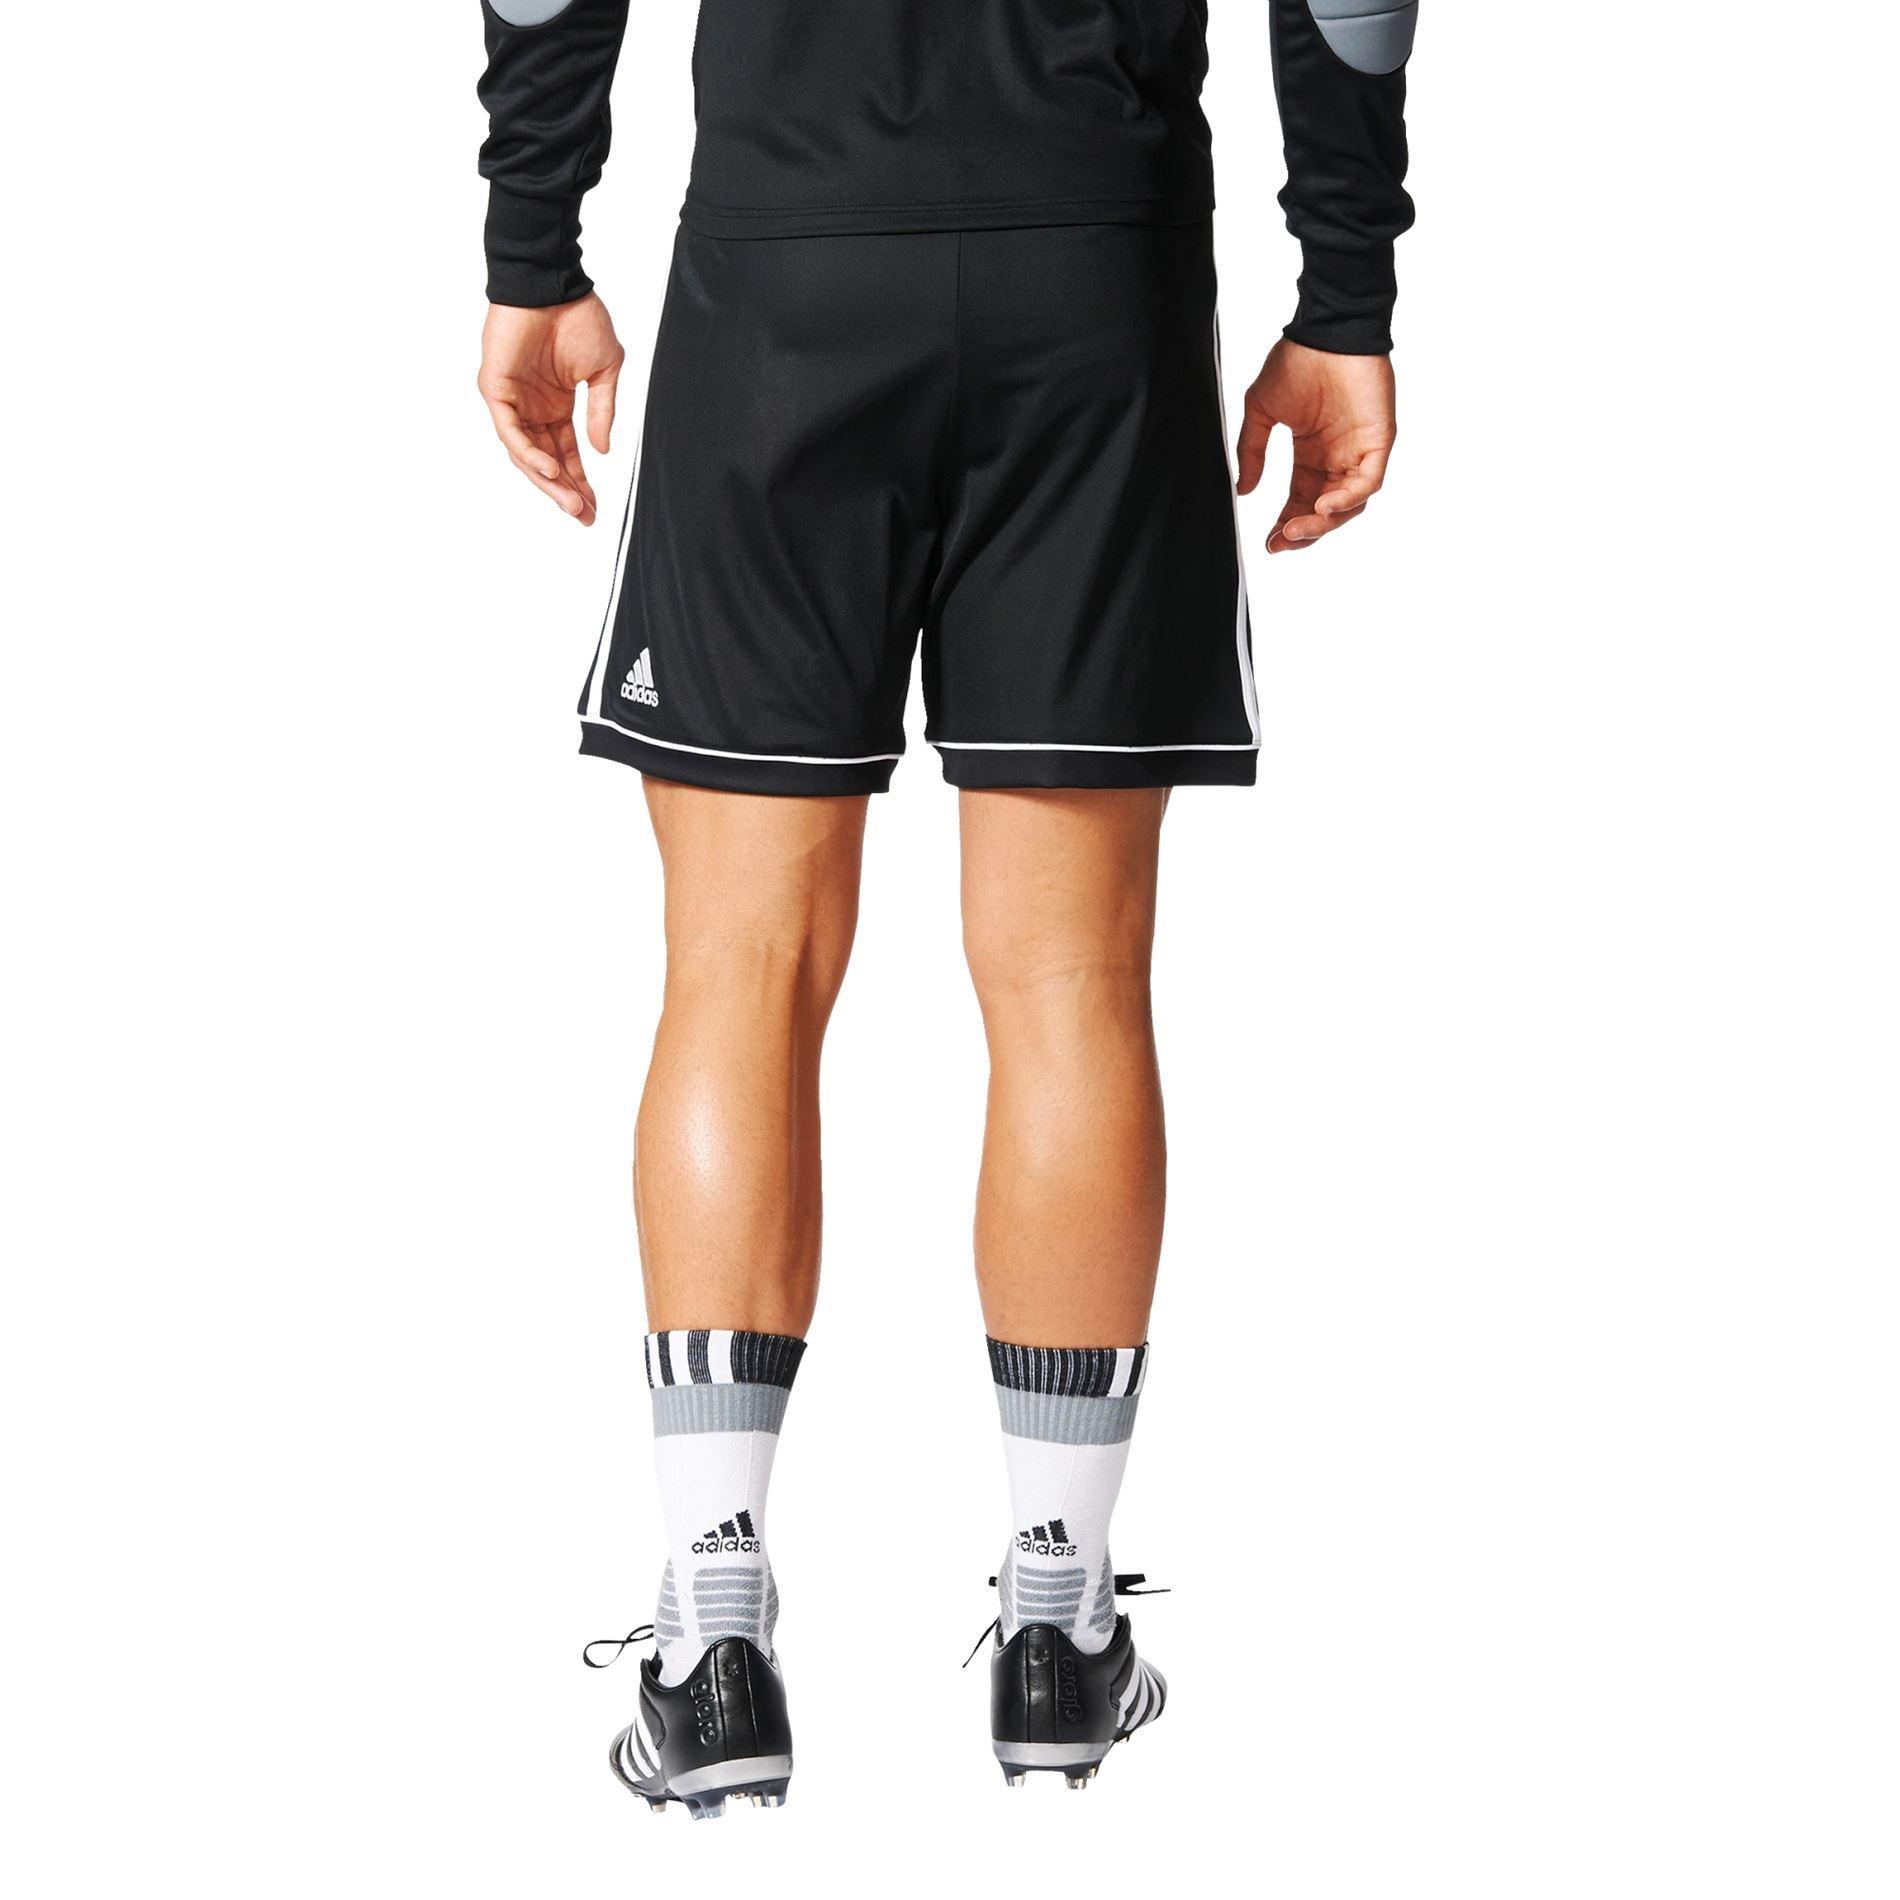 08a71745 Adidas Squad 17 Shorts WB Svart/Hvit- Fotballsko.no - Sko fra Adidas, Nike  og Puma. Nor-Contact Sport